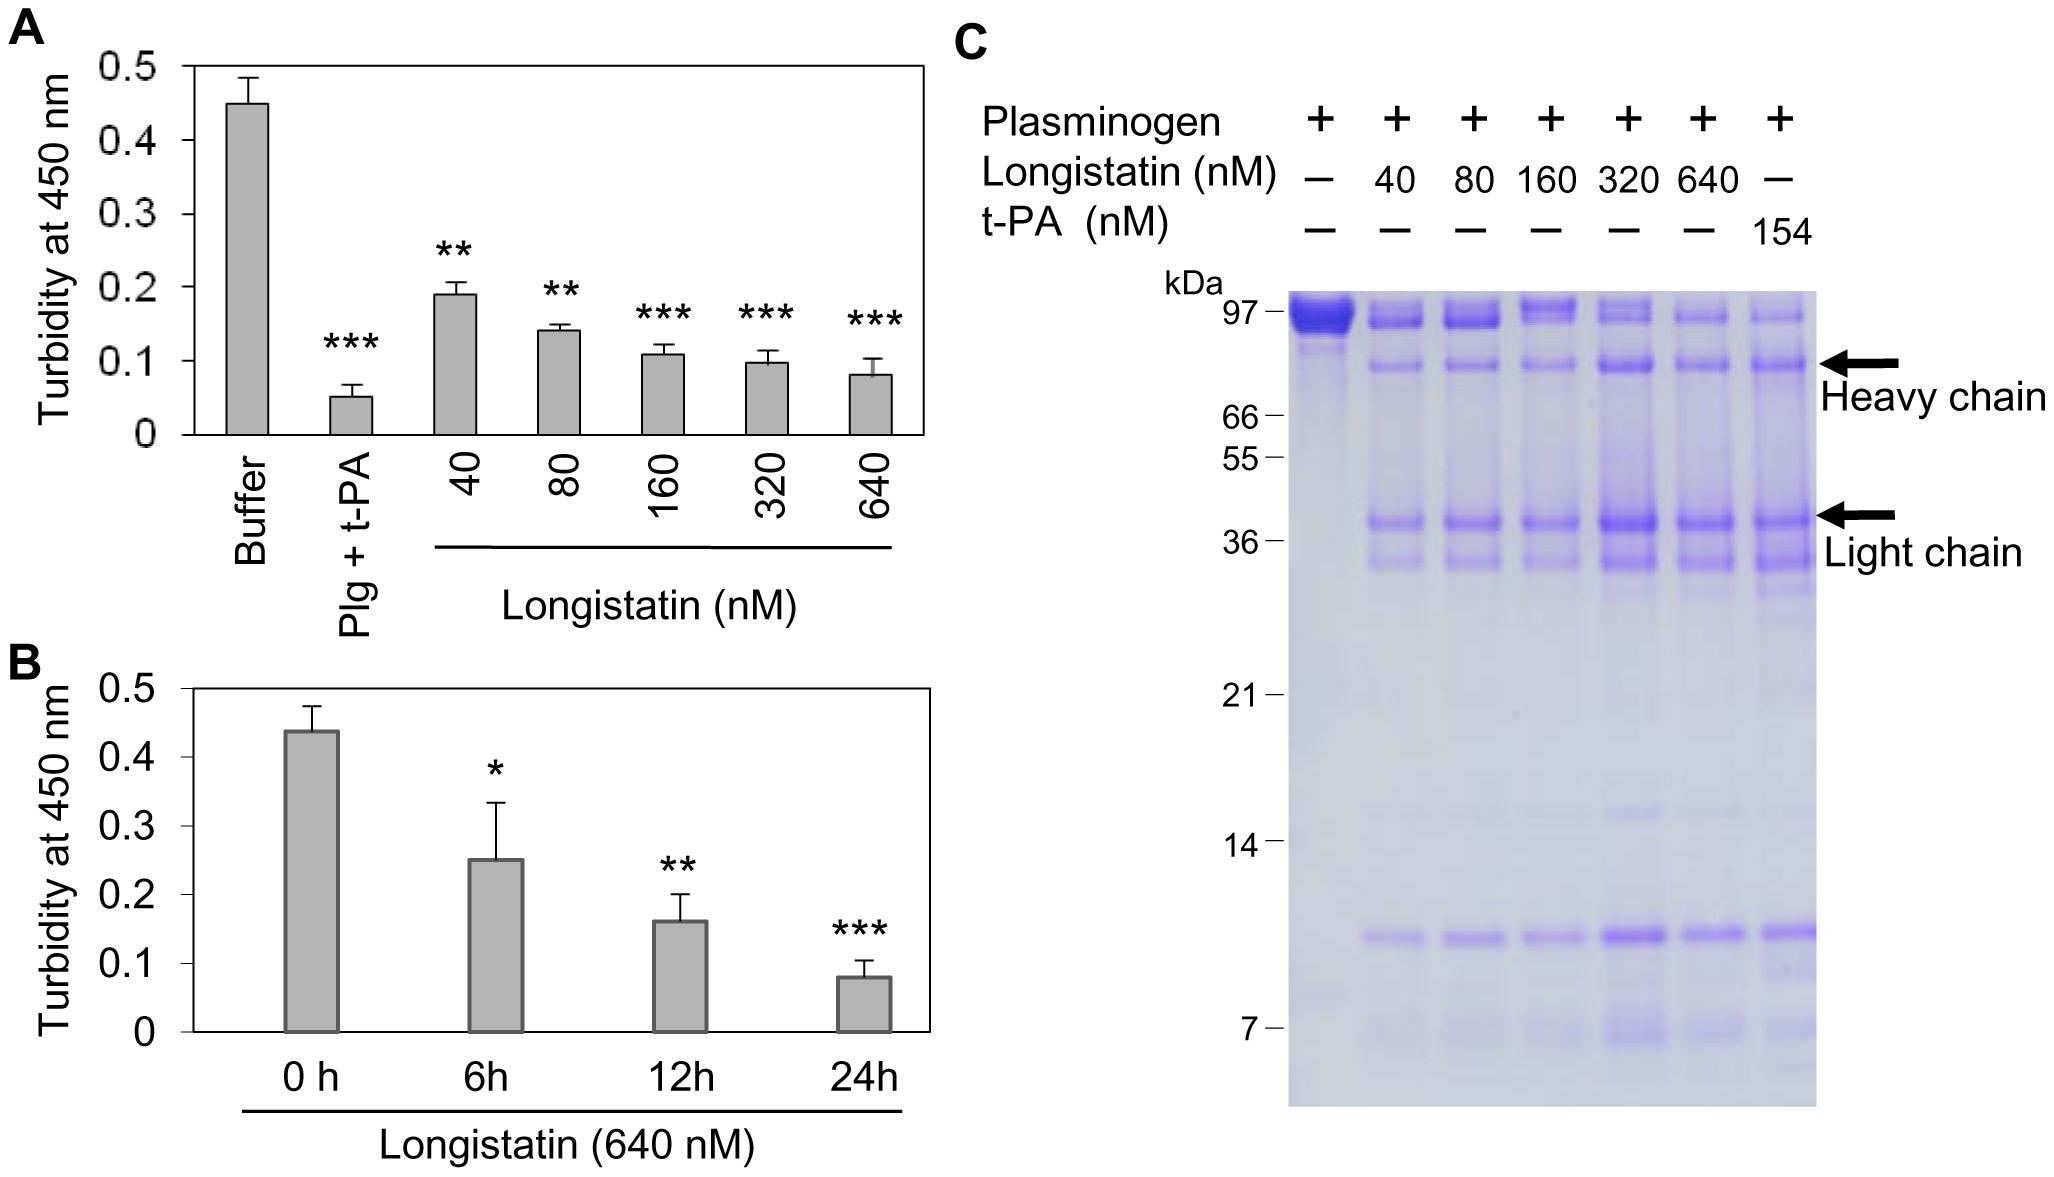 Longistatin induced fibrinolysis by activating plasminogen.